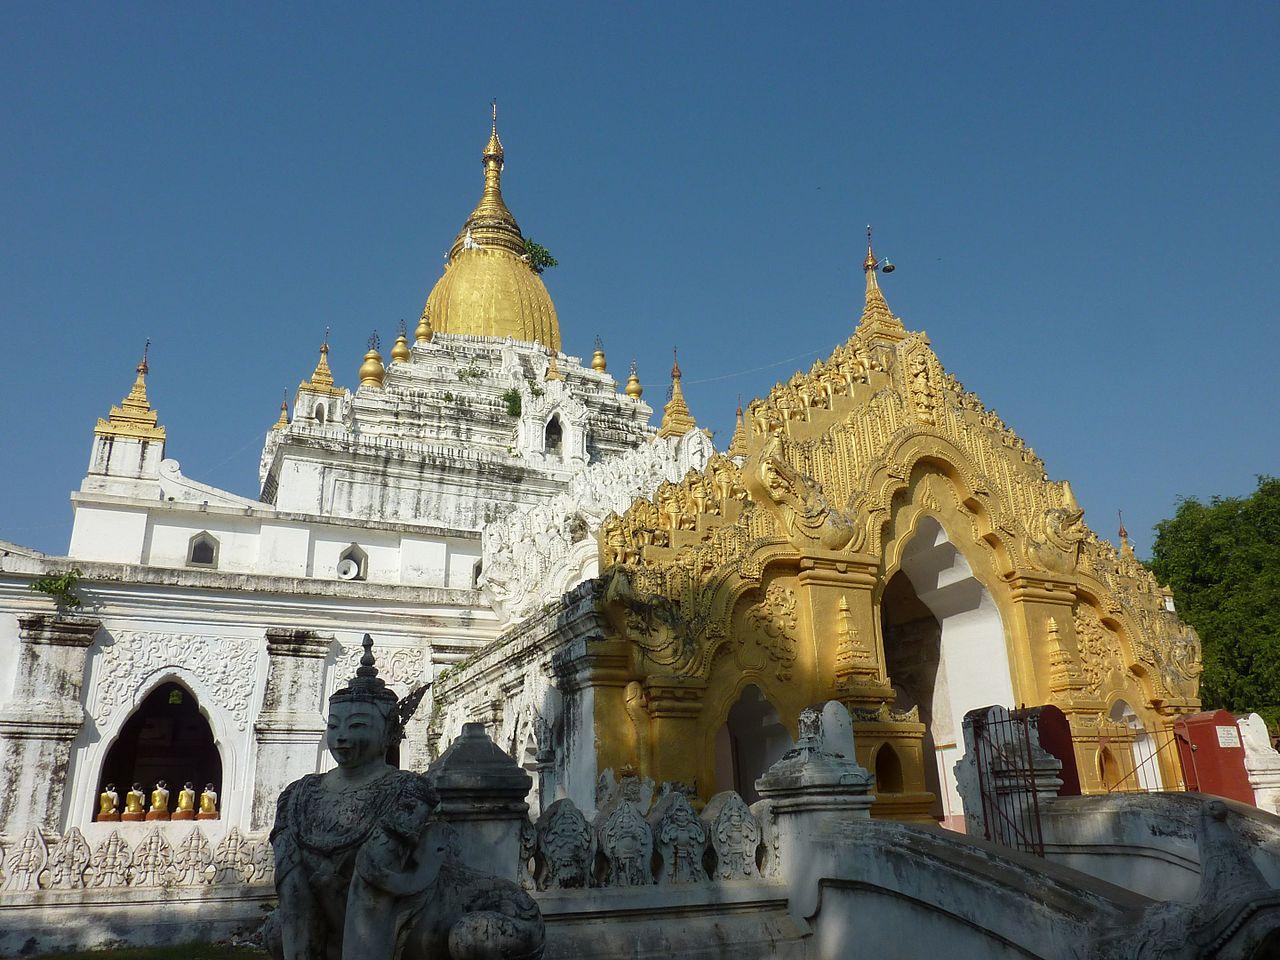 001 Pagoda (8946290829).jpg